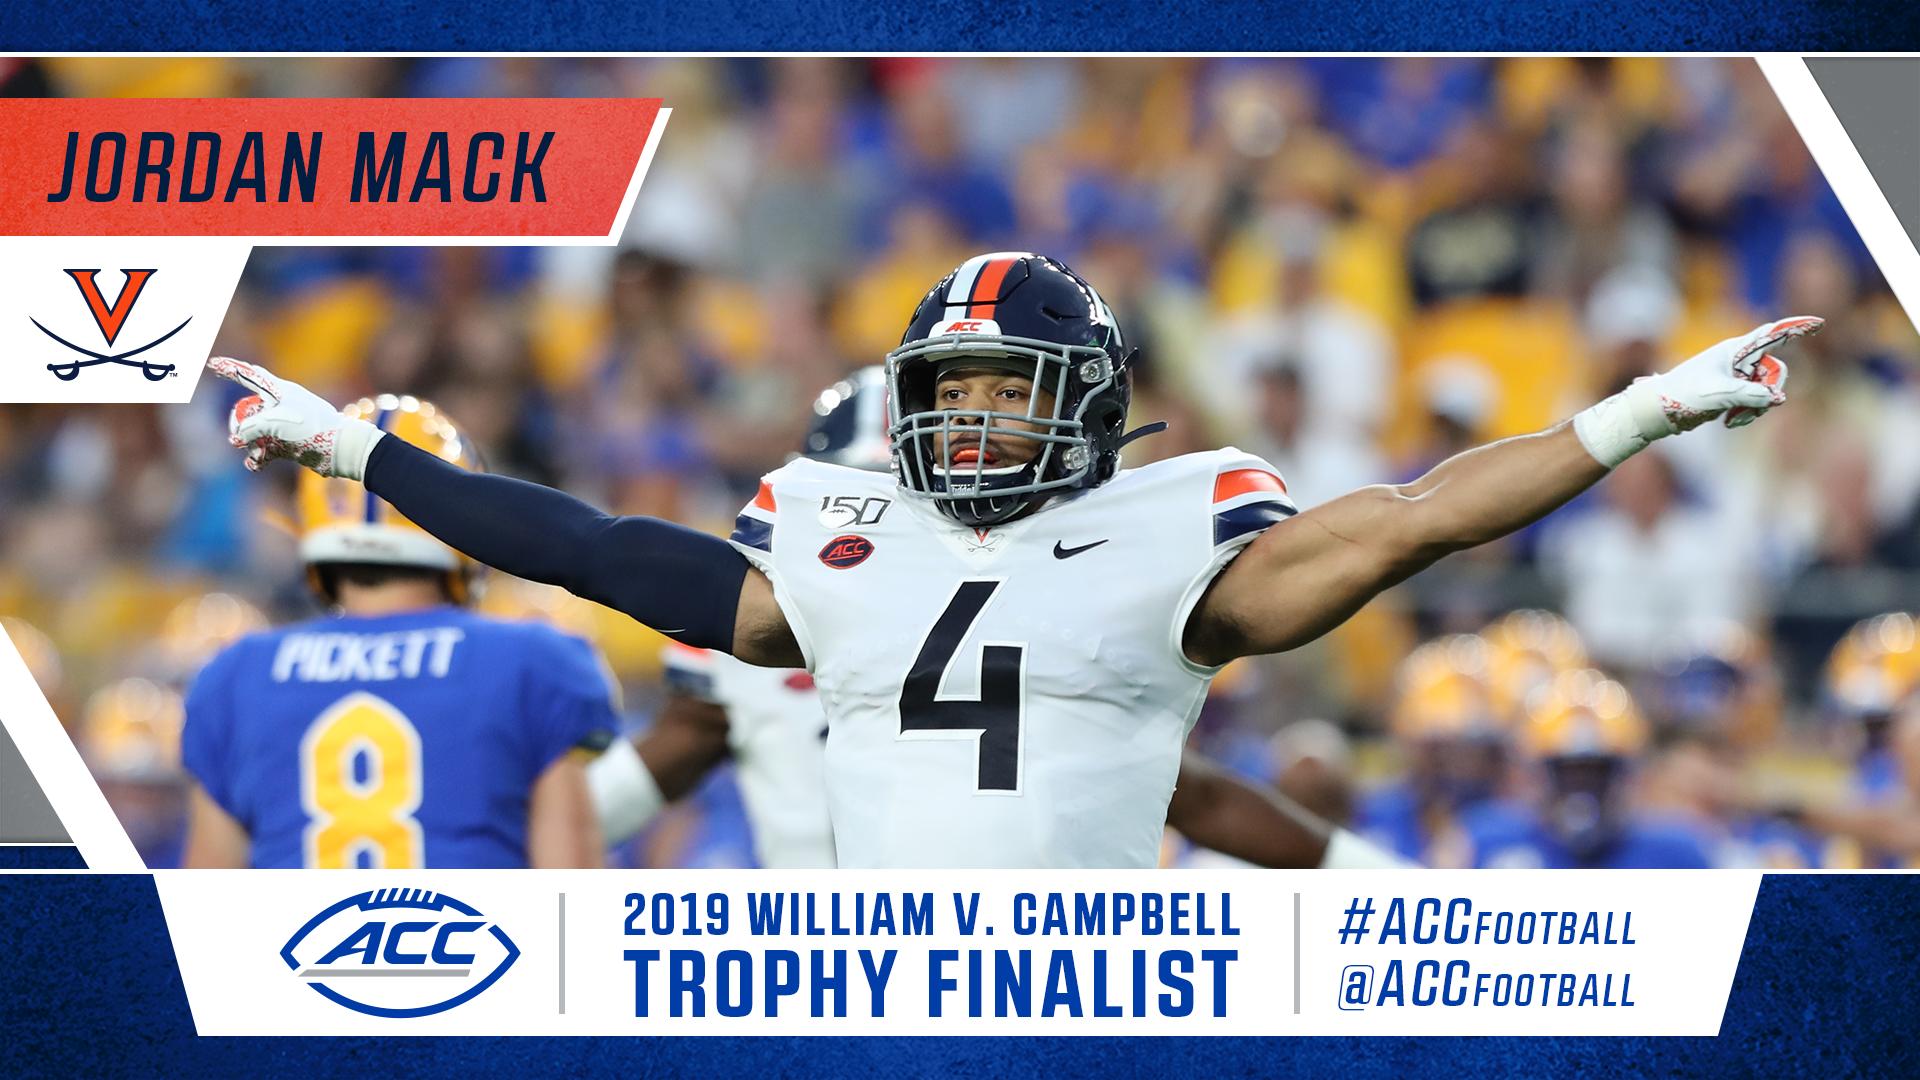 Virginia S Jordan Mack Named Campbell Trophy Finalist